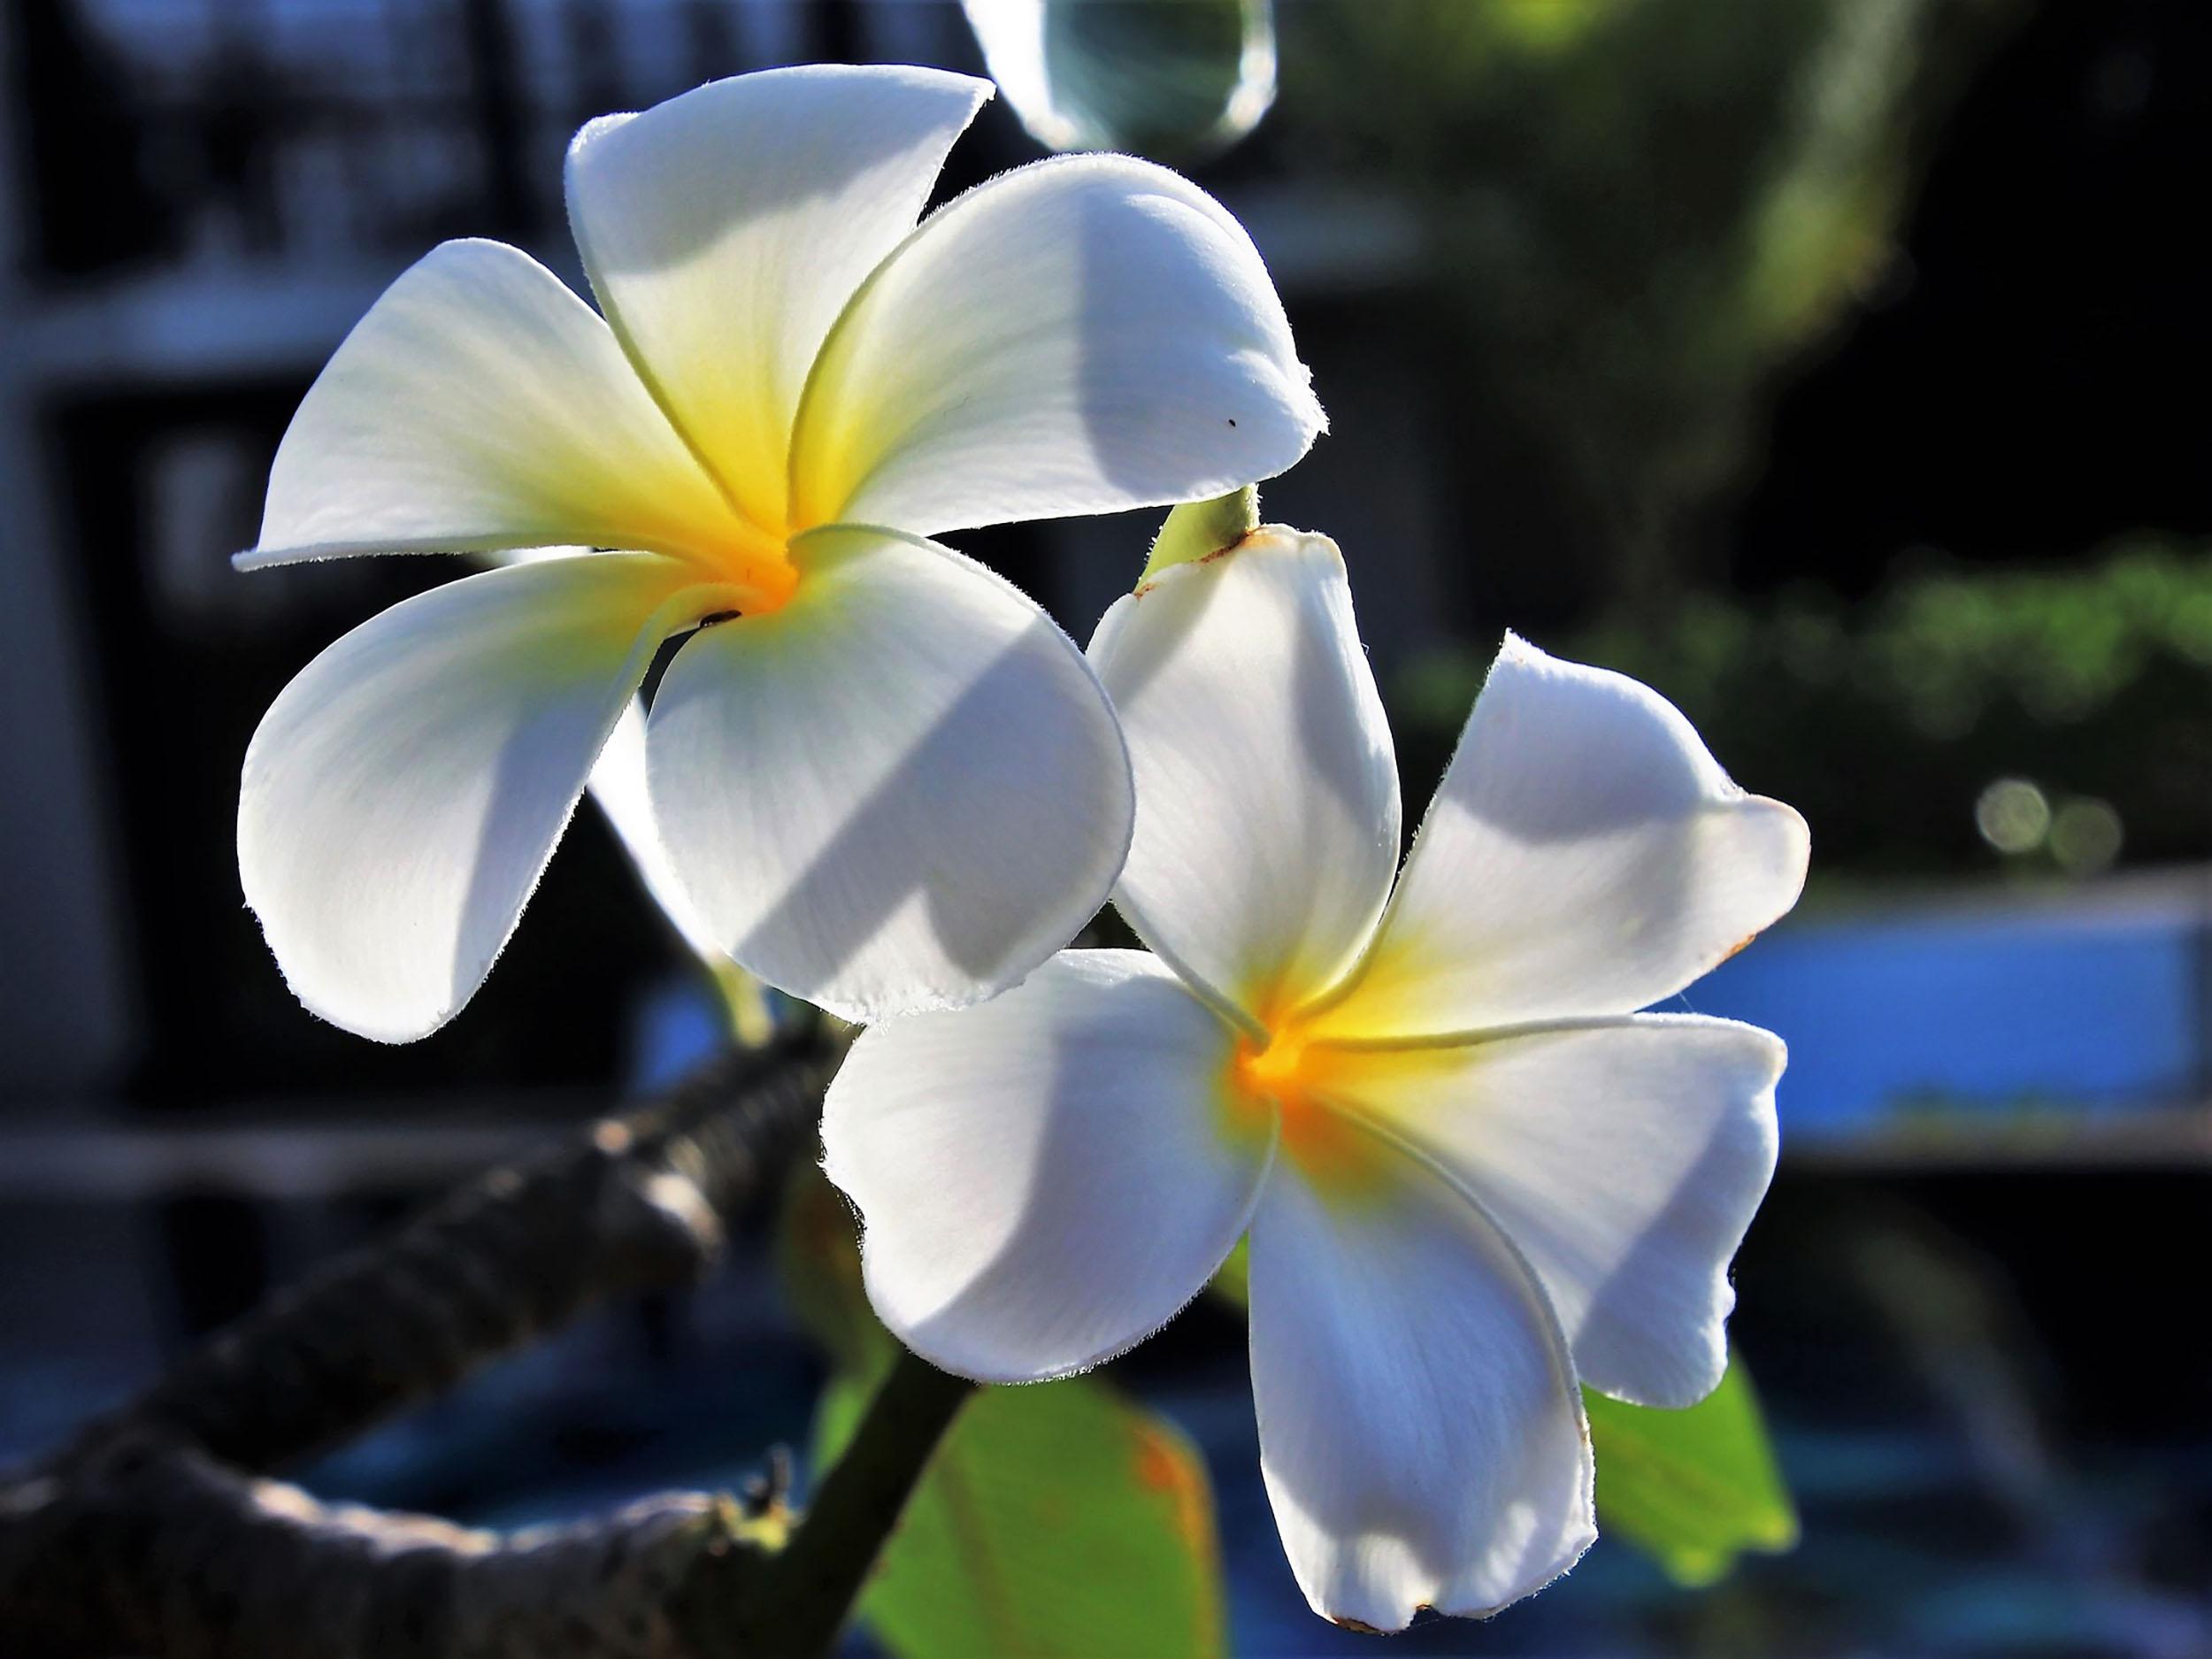 Frangipanis can be found everywhere in Sri Lanka